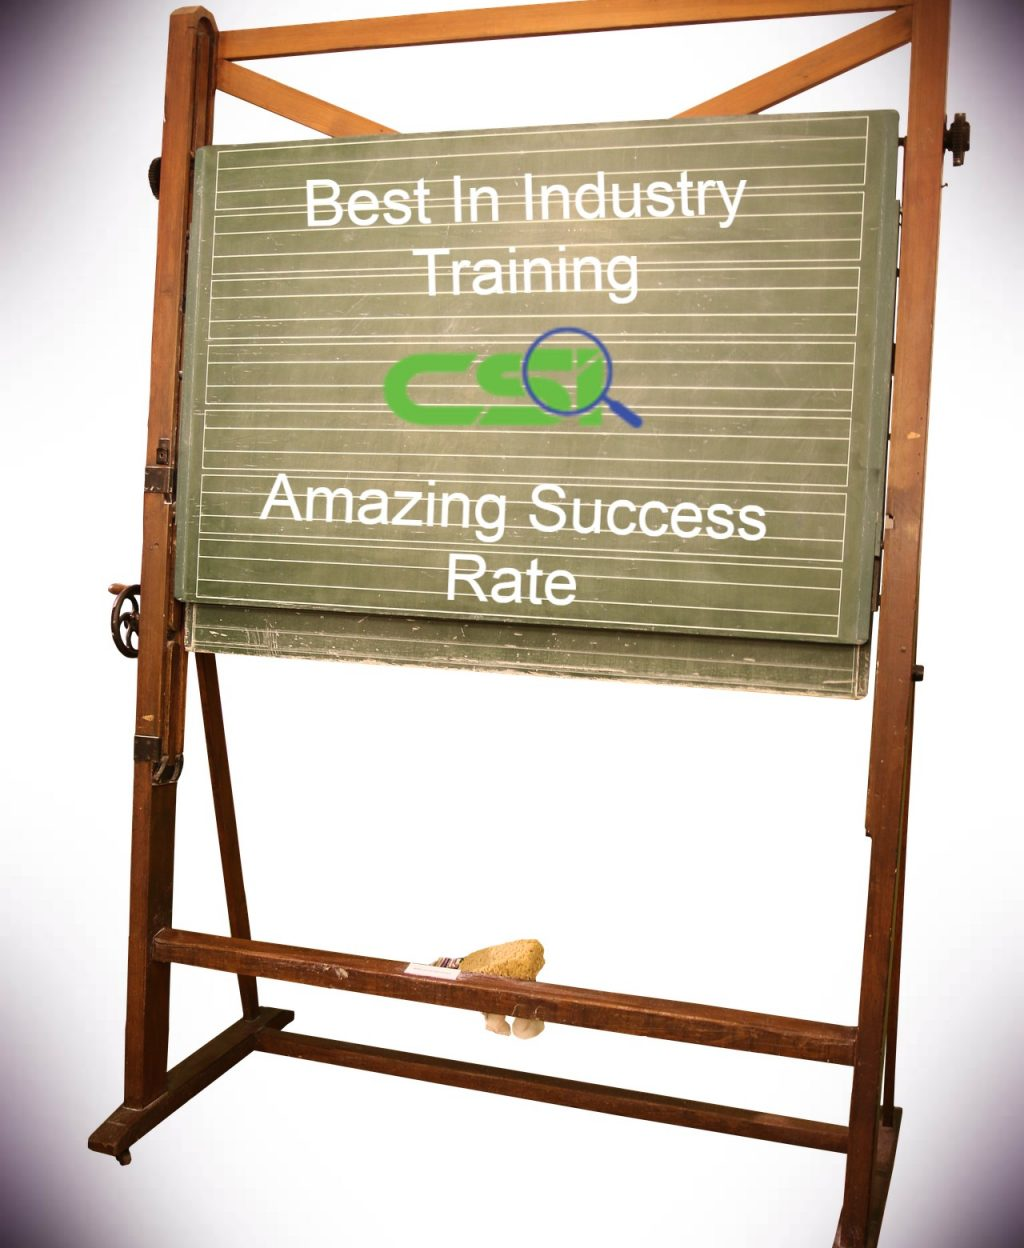 Training Chaulk Board